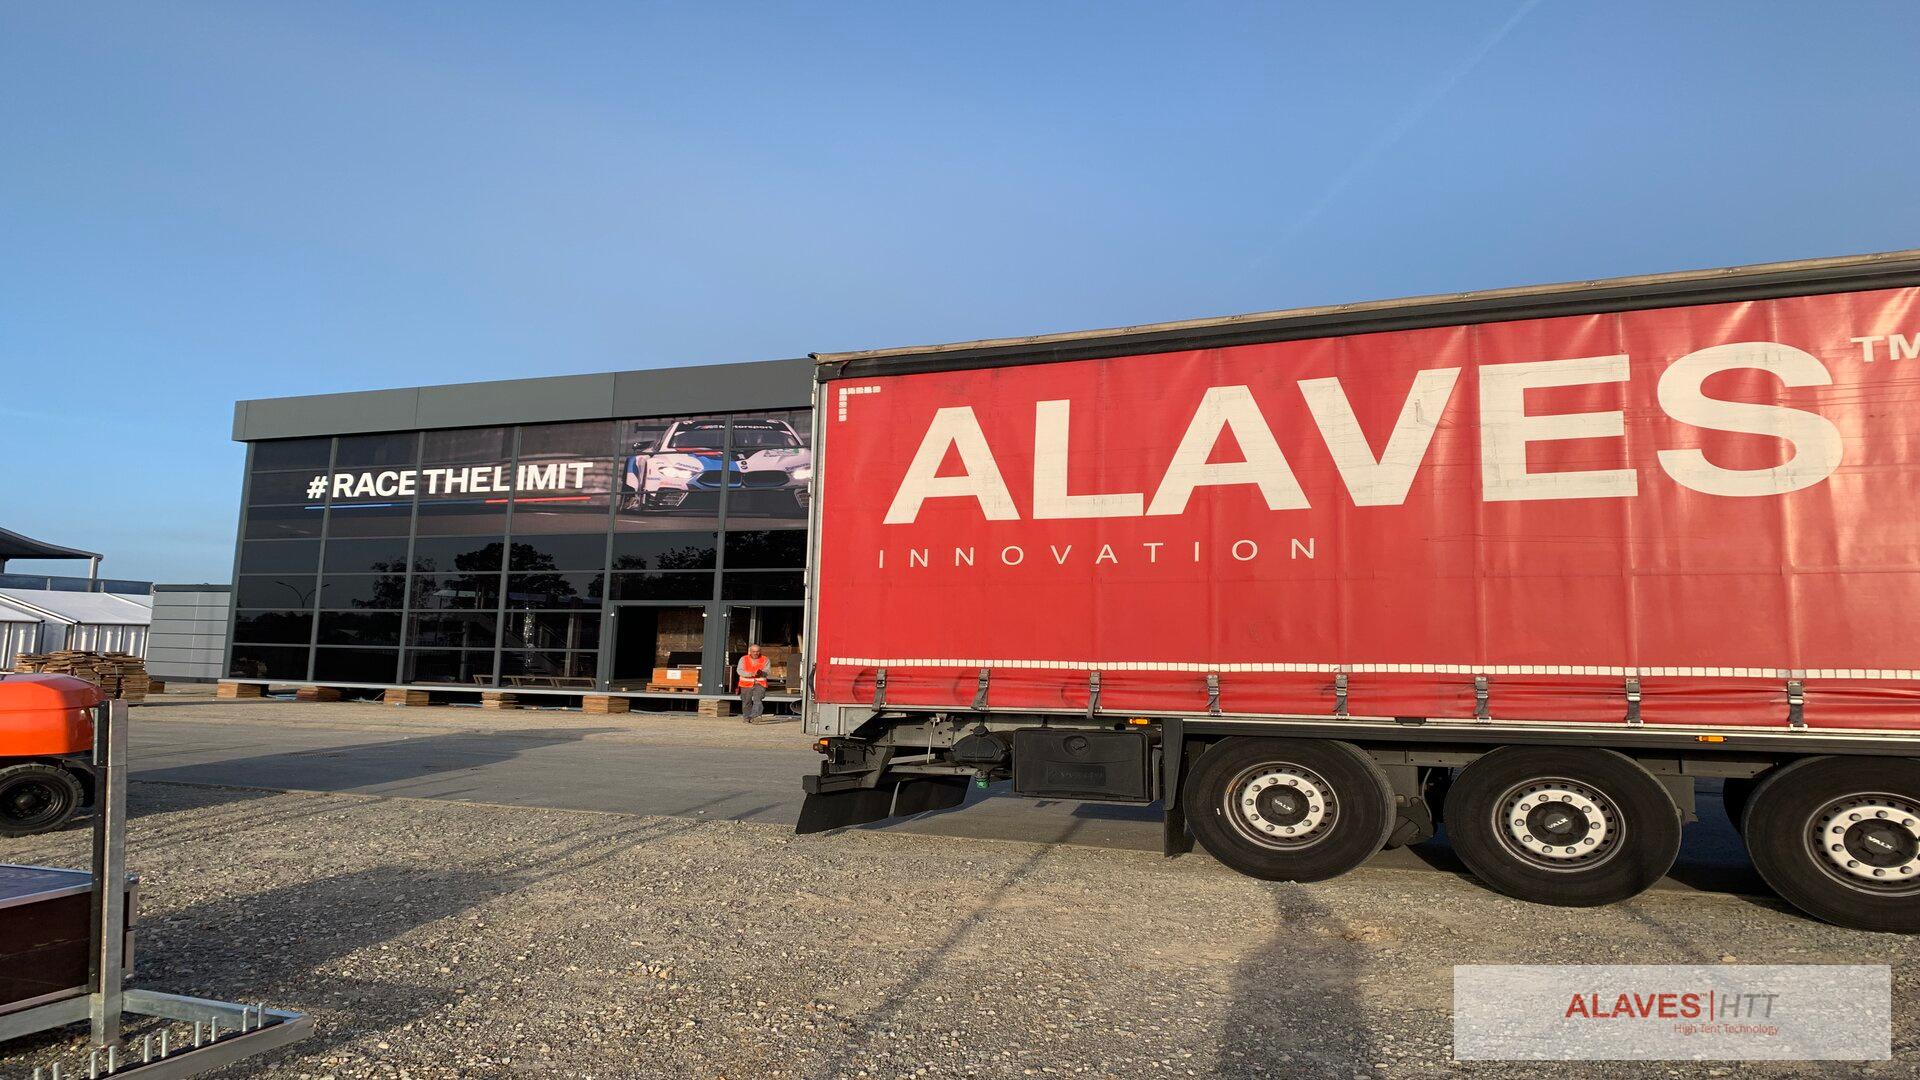 Alaves HTT FAQS